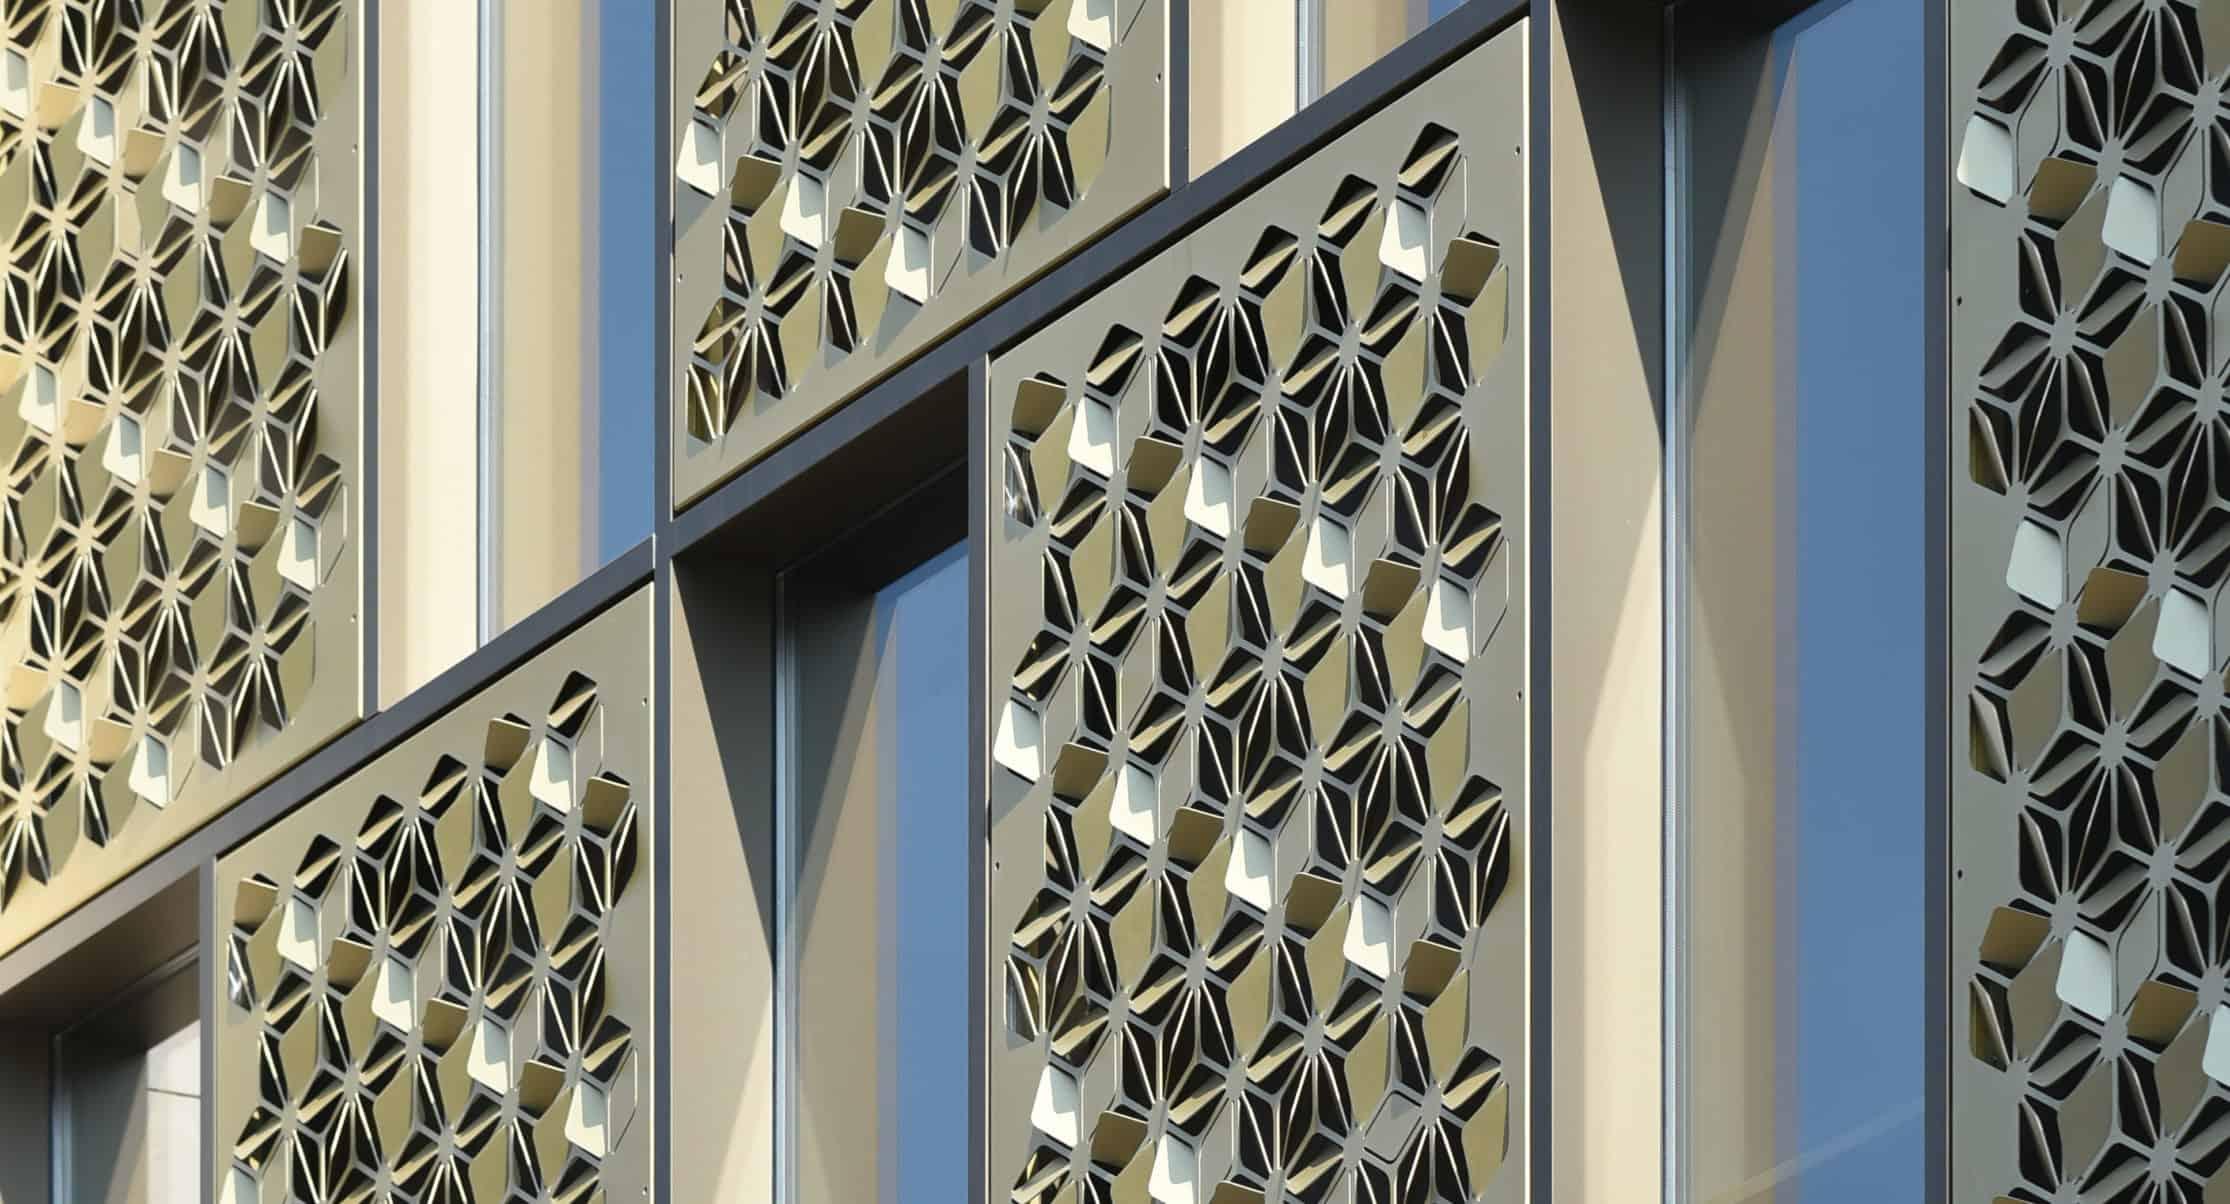 MD Formatura perforatie gevelbekleding MD Formatura perforation facade